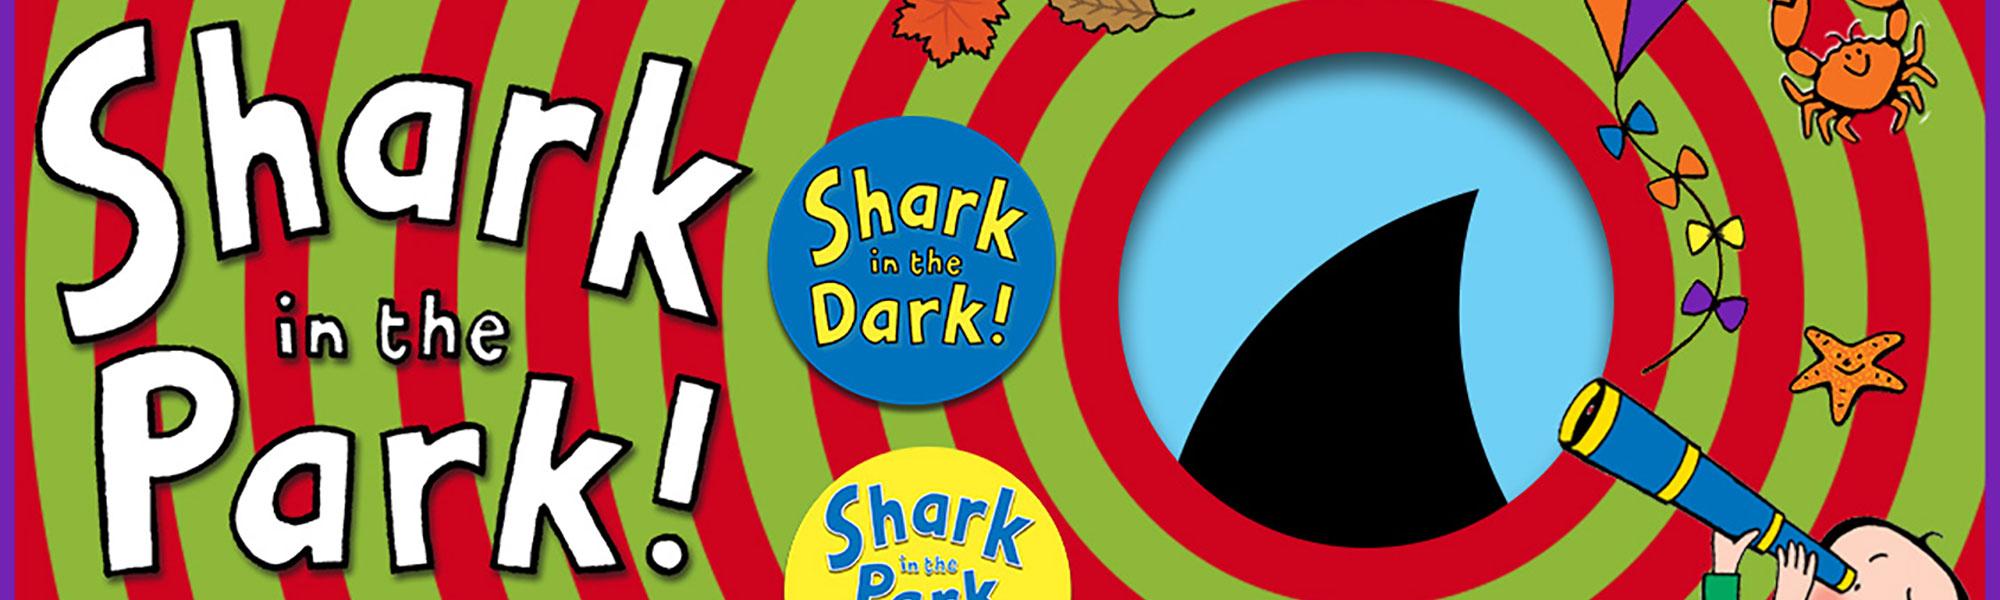 Shark In The Park Banner